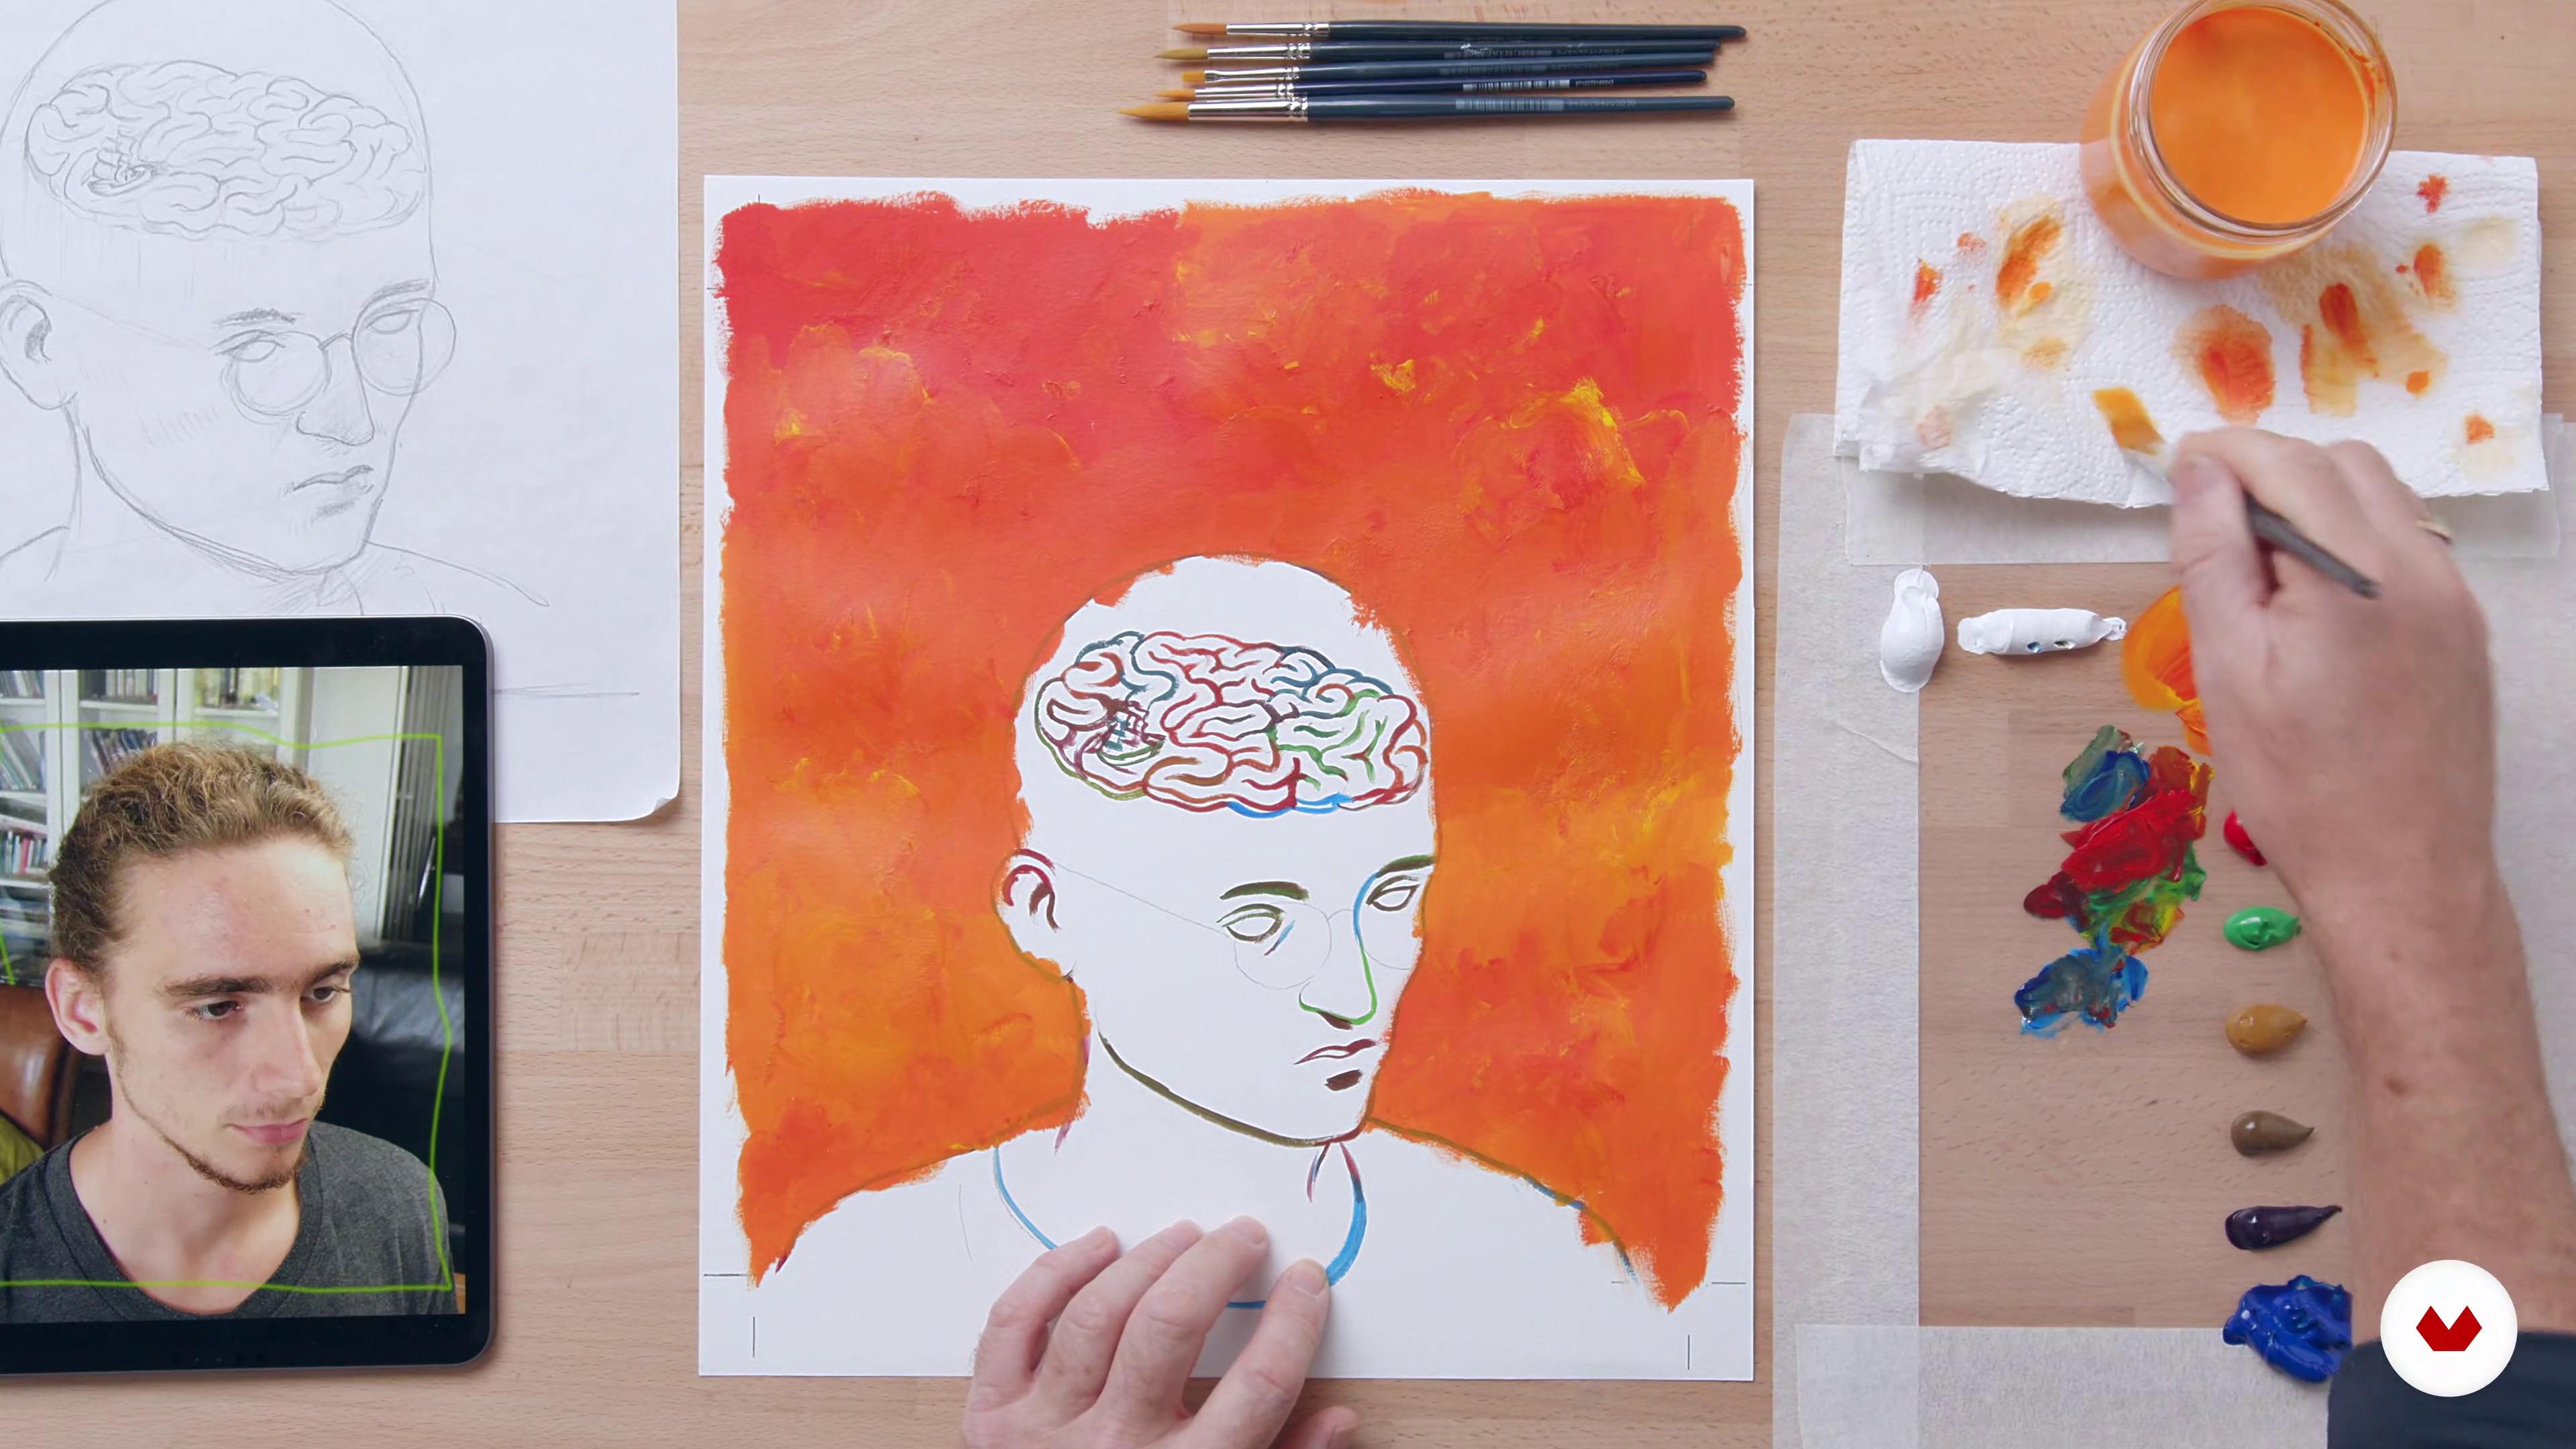 Painting The Background Acrylic Techniques For Creative Illustration Jon 24 Domestika